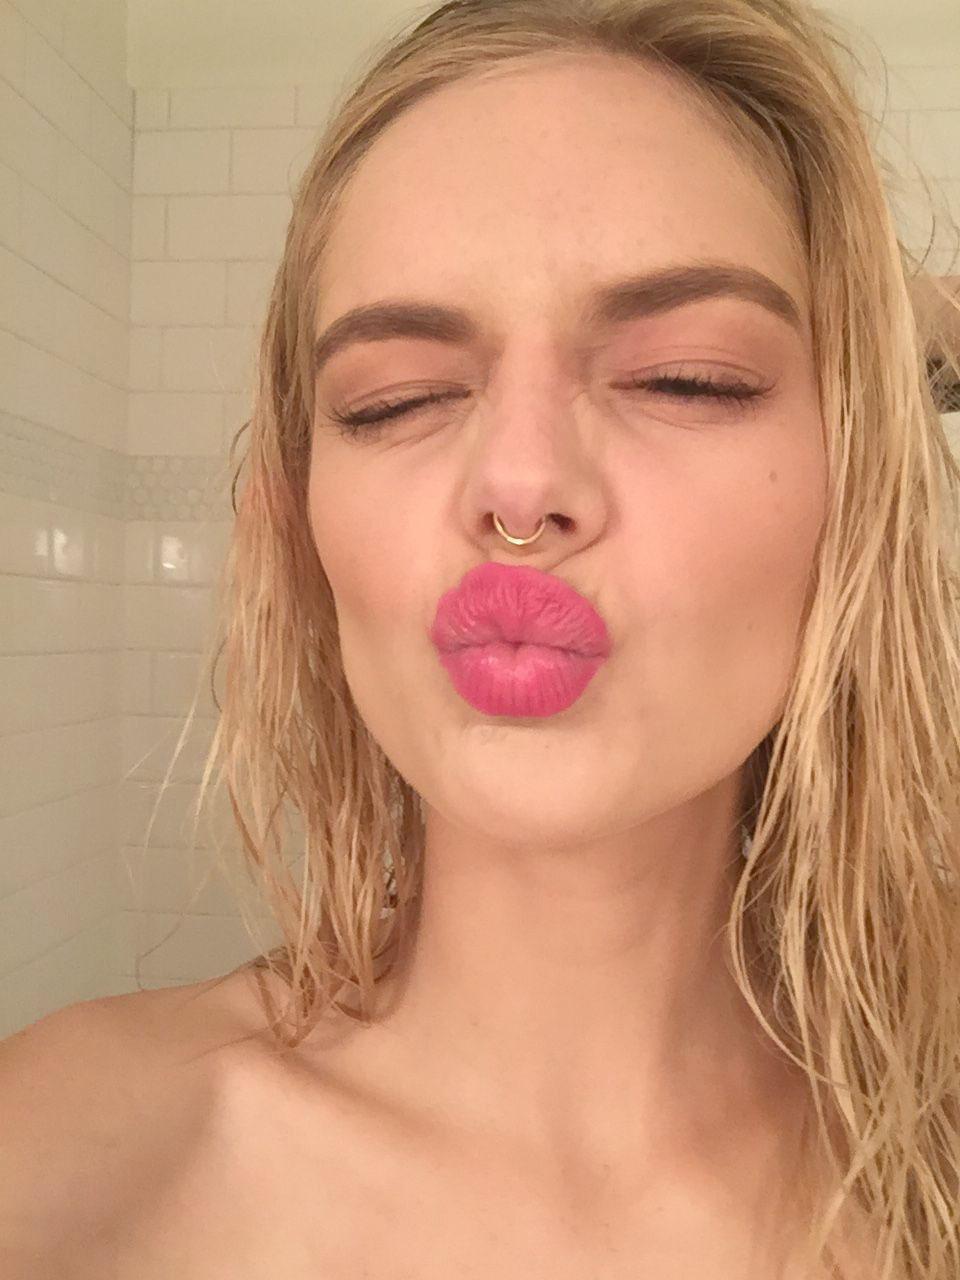 Hugo Weaving niece and Netflix star Samara Weaving nude Leaked